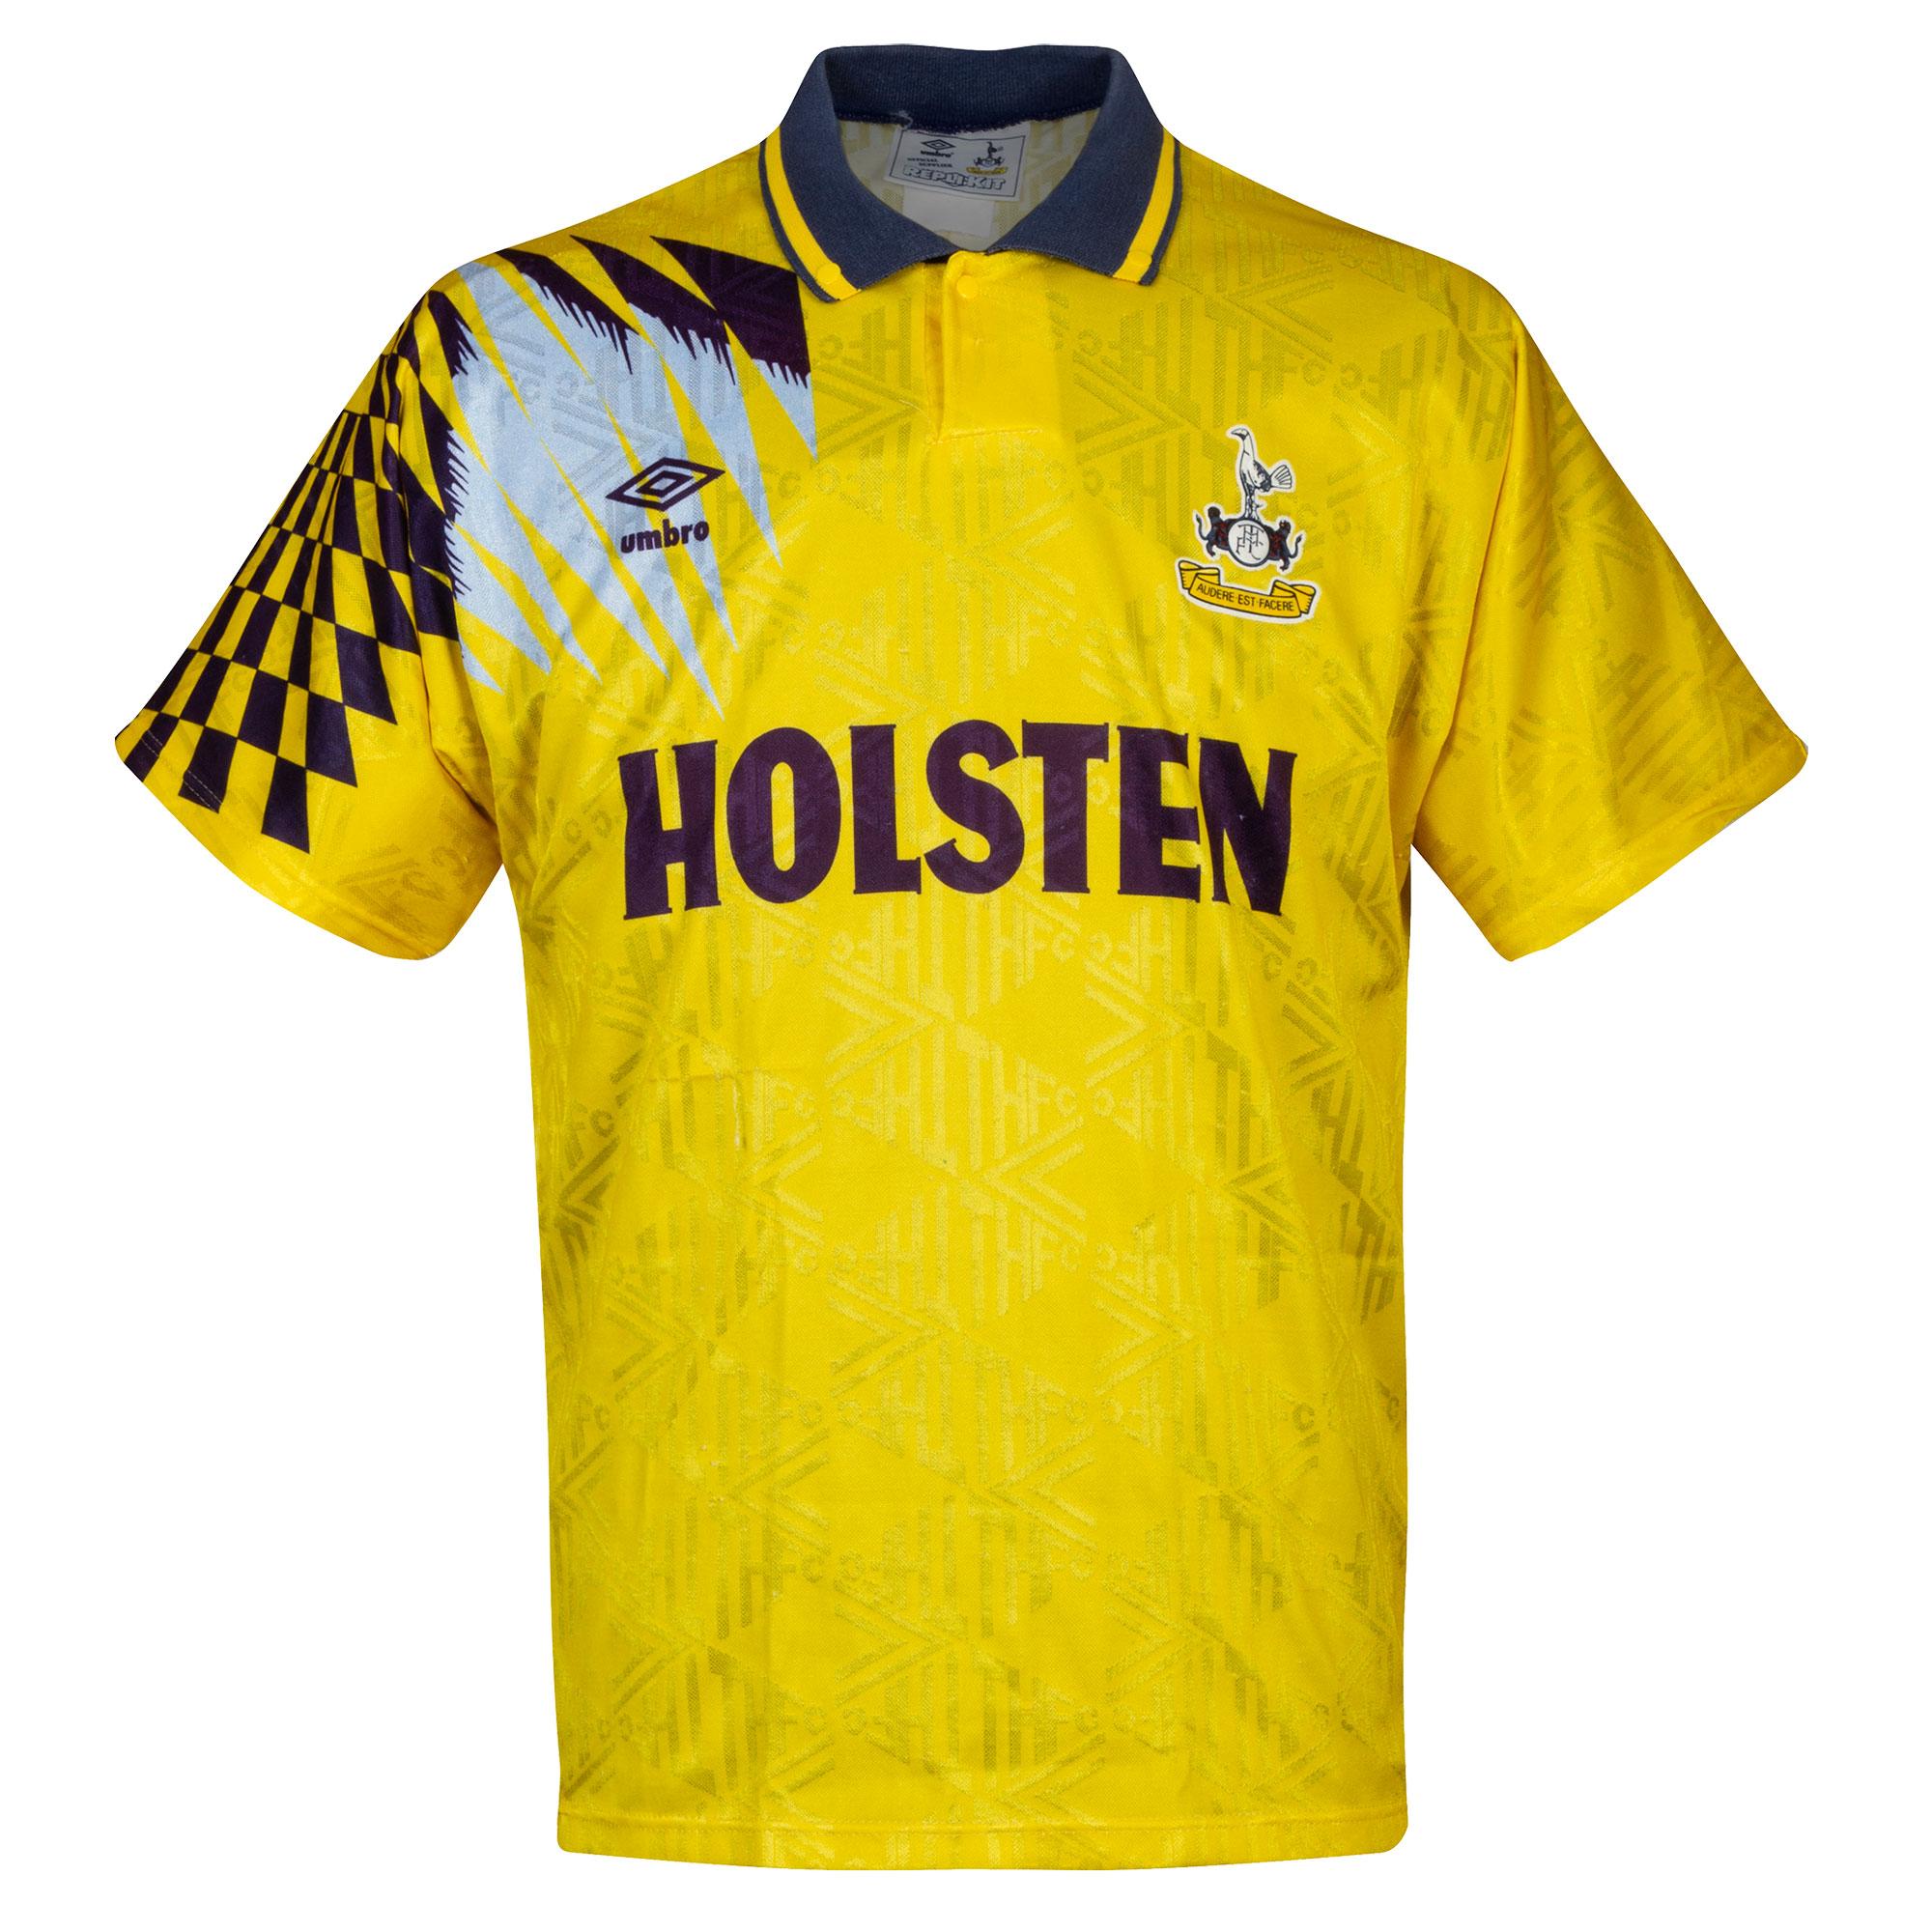 Umbro Tottenham Hotspur Away 1991-1994 Shirt - USED Condition (Good)